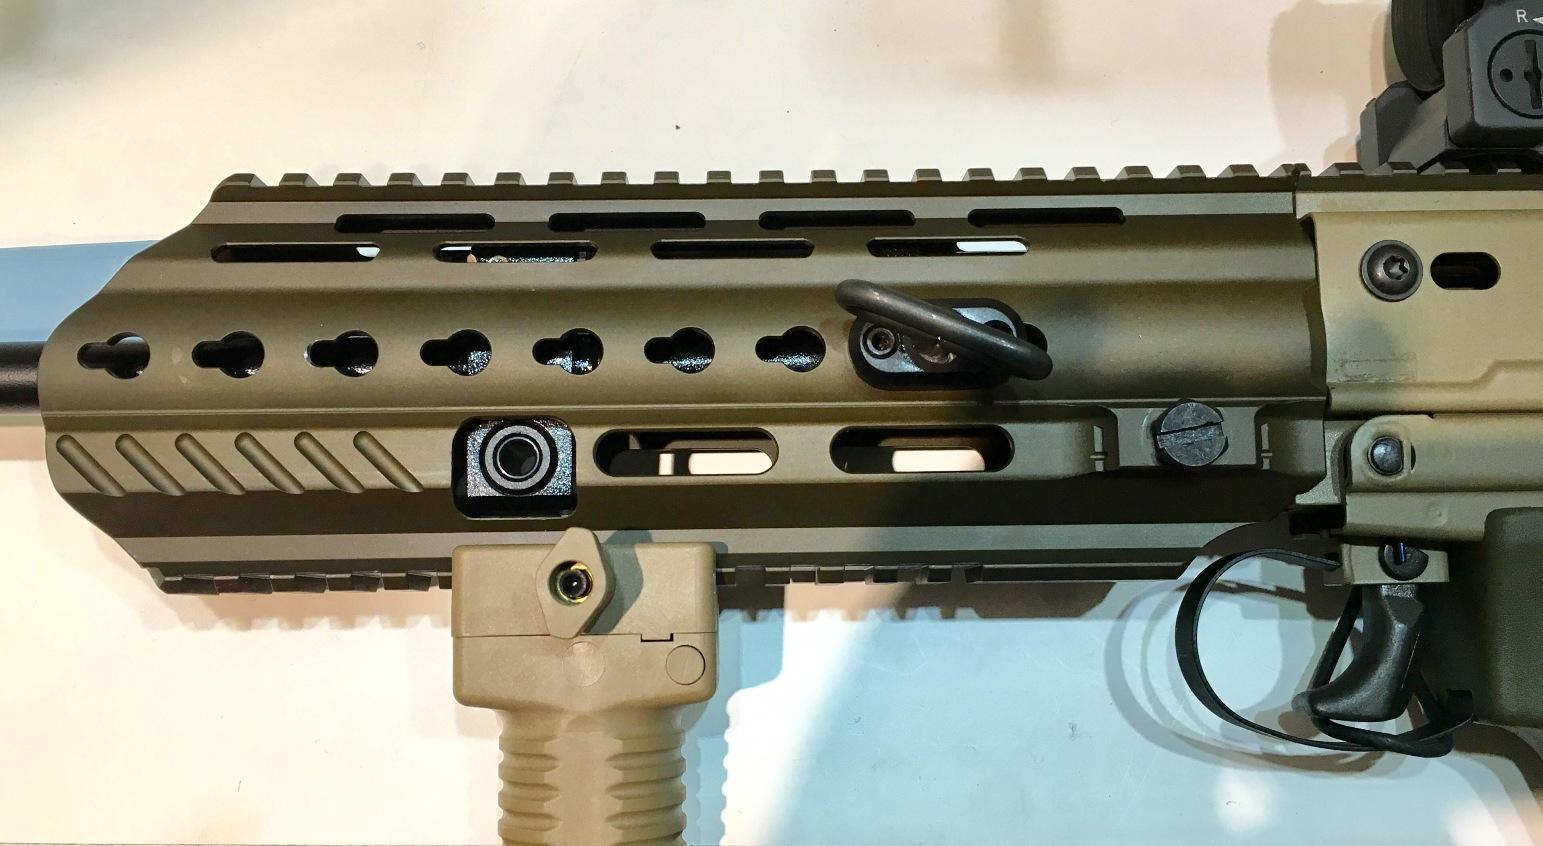 Sling mount options for the HKey / Slim Line handguards?-sa80-a3.jpg